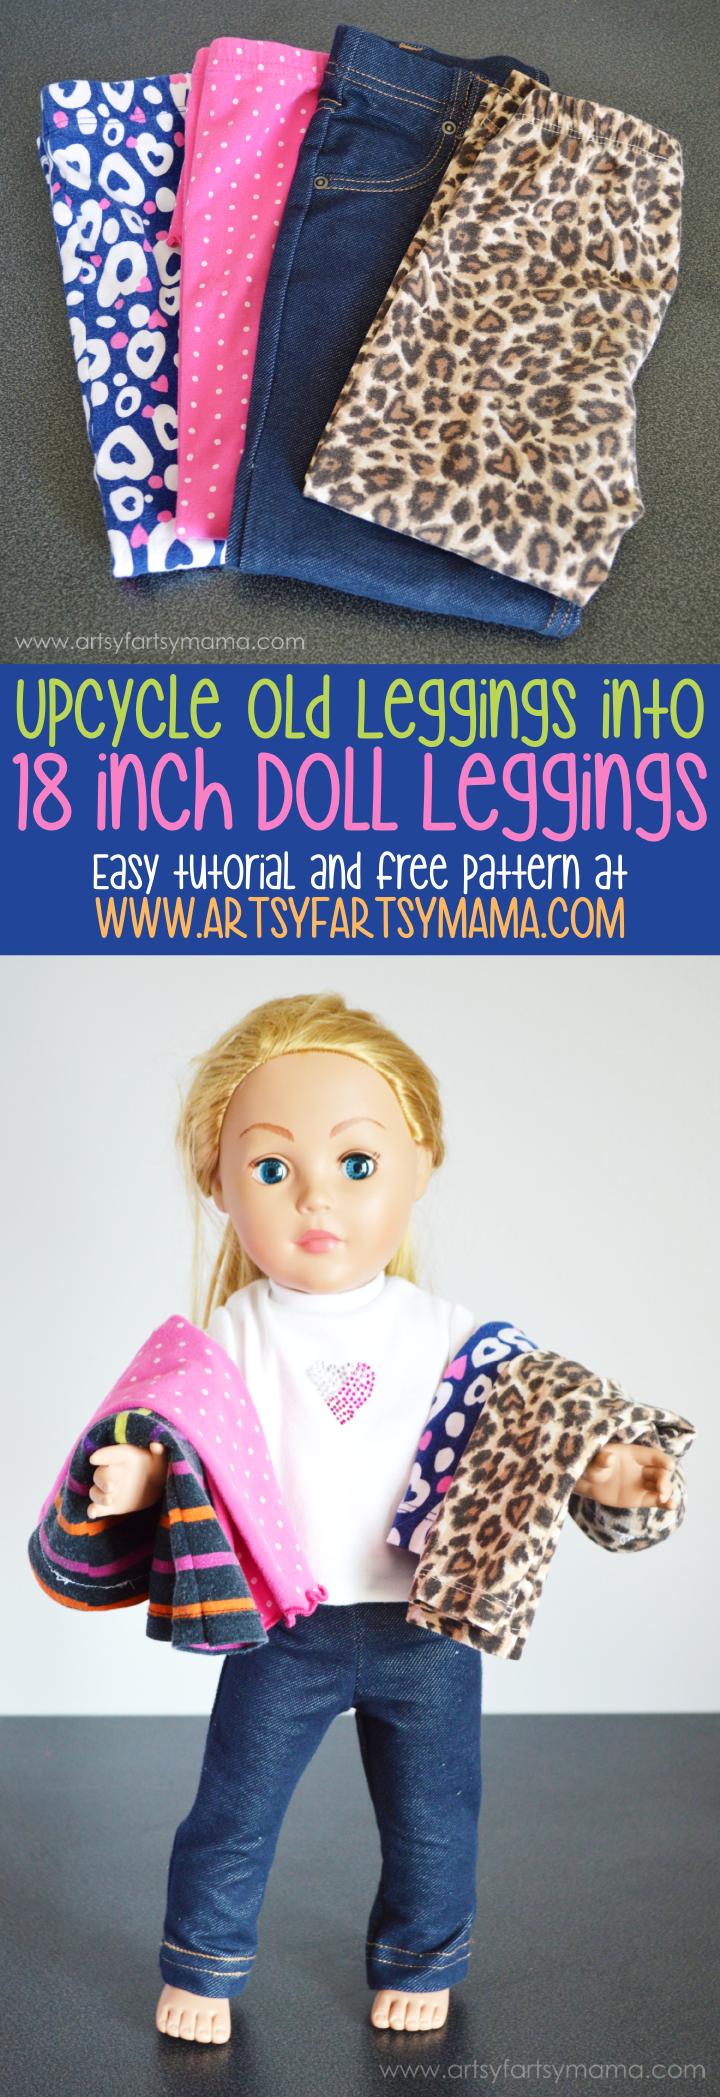 Easy 18 Inch Doll Leggings Tutorial   Puppenkleidung, Puppenkleider ...